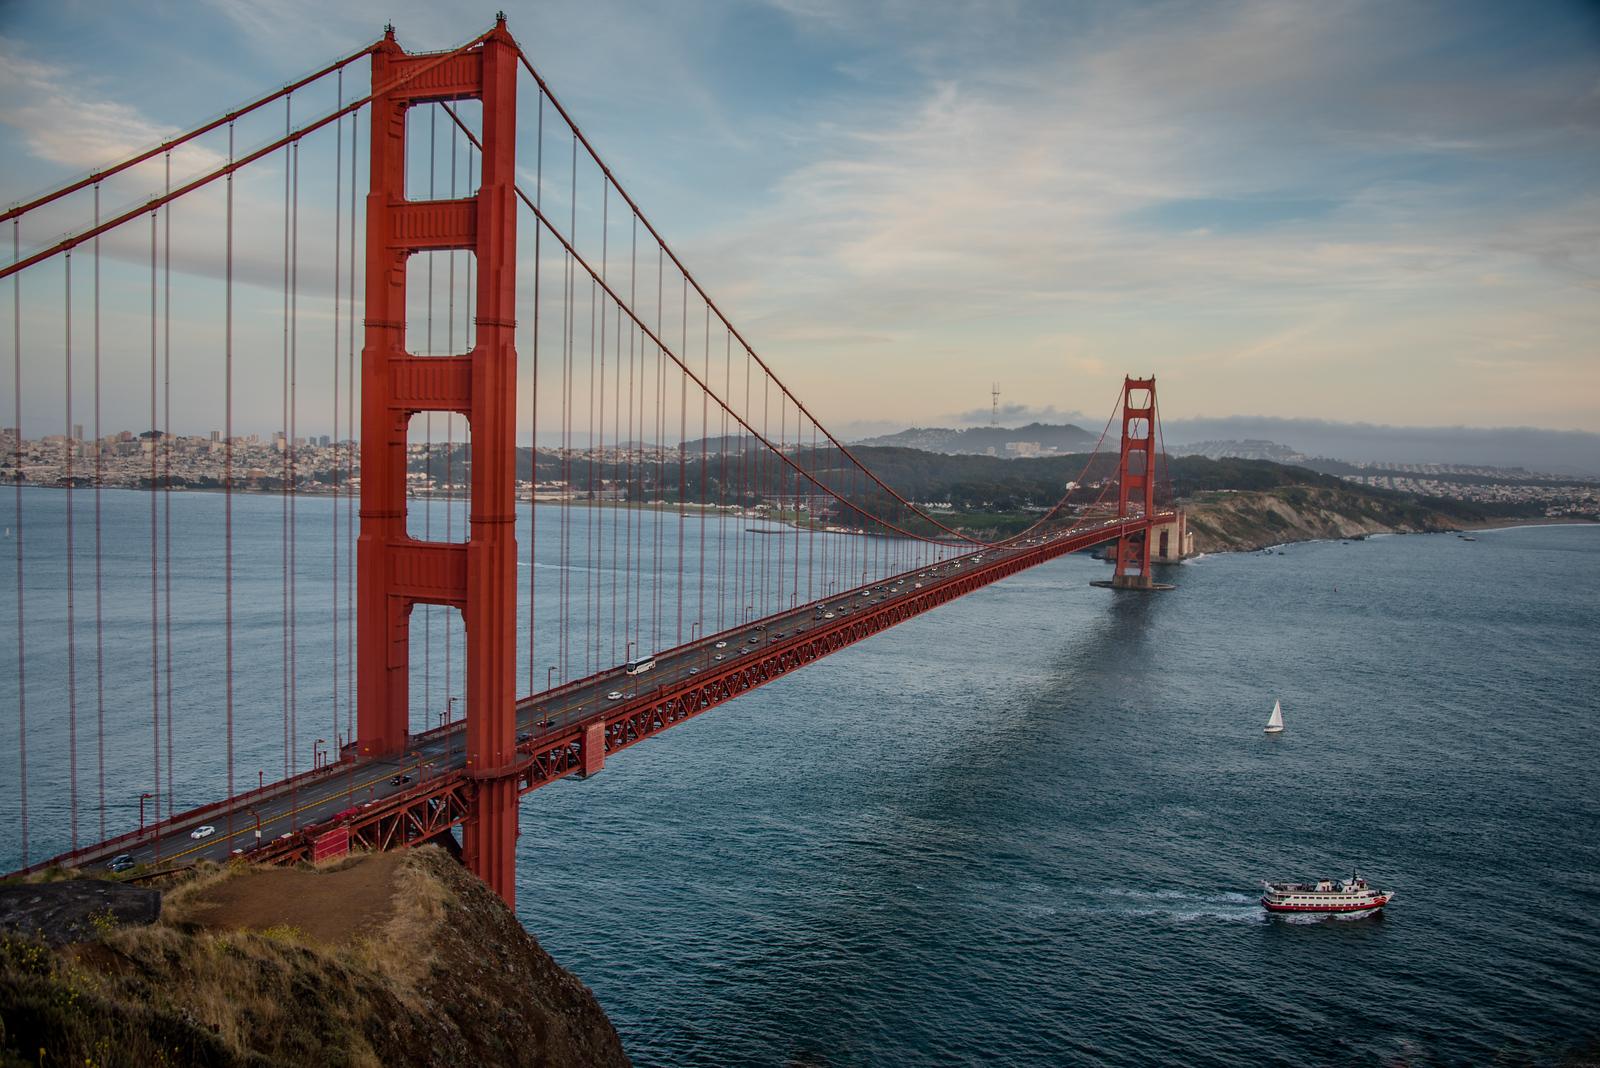 Golden Gate Bridge from Battery Spencer, Marin Headlands, California, June 2017.